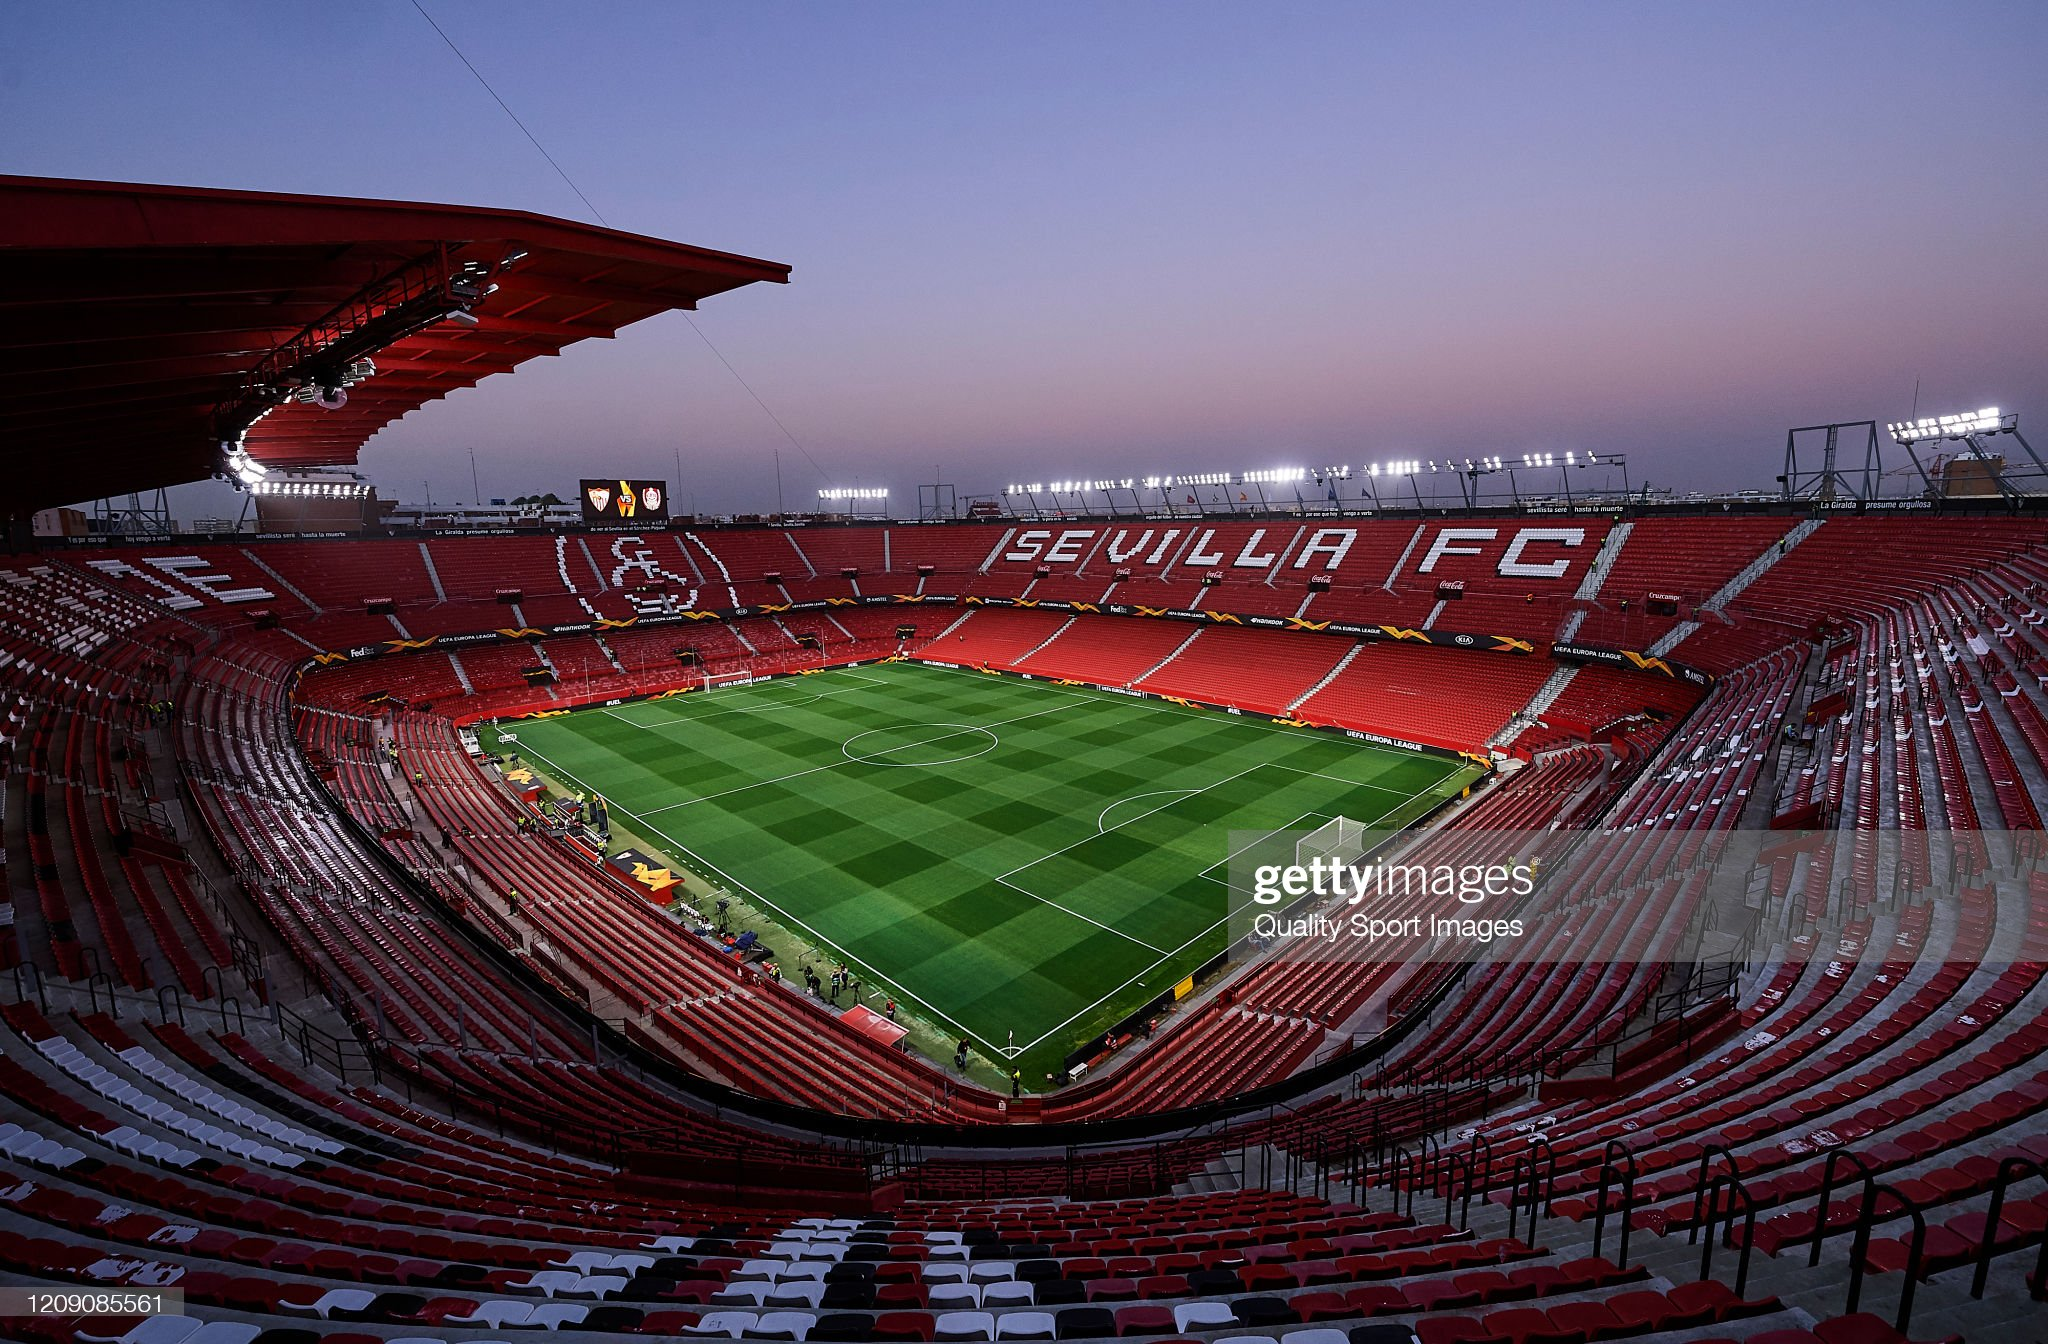 Sevilla vs Real Betis Preview, prediction and odds